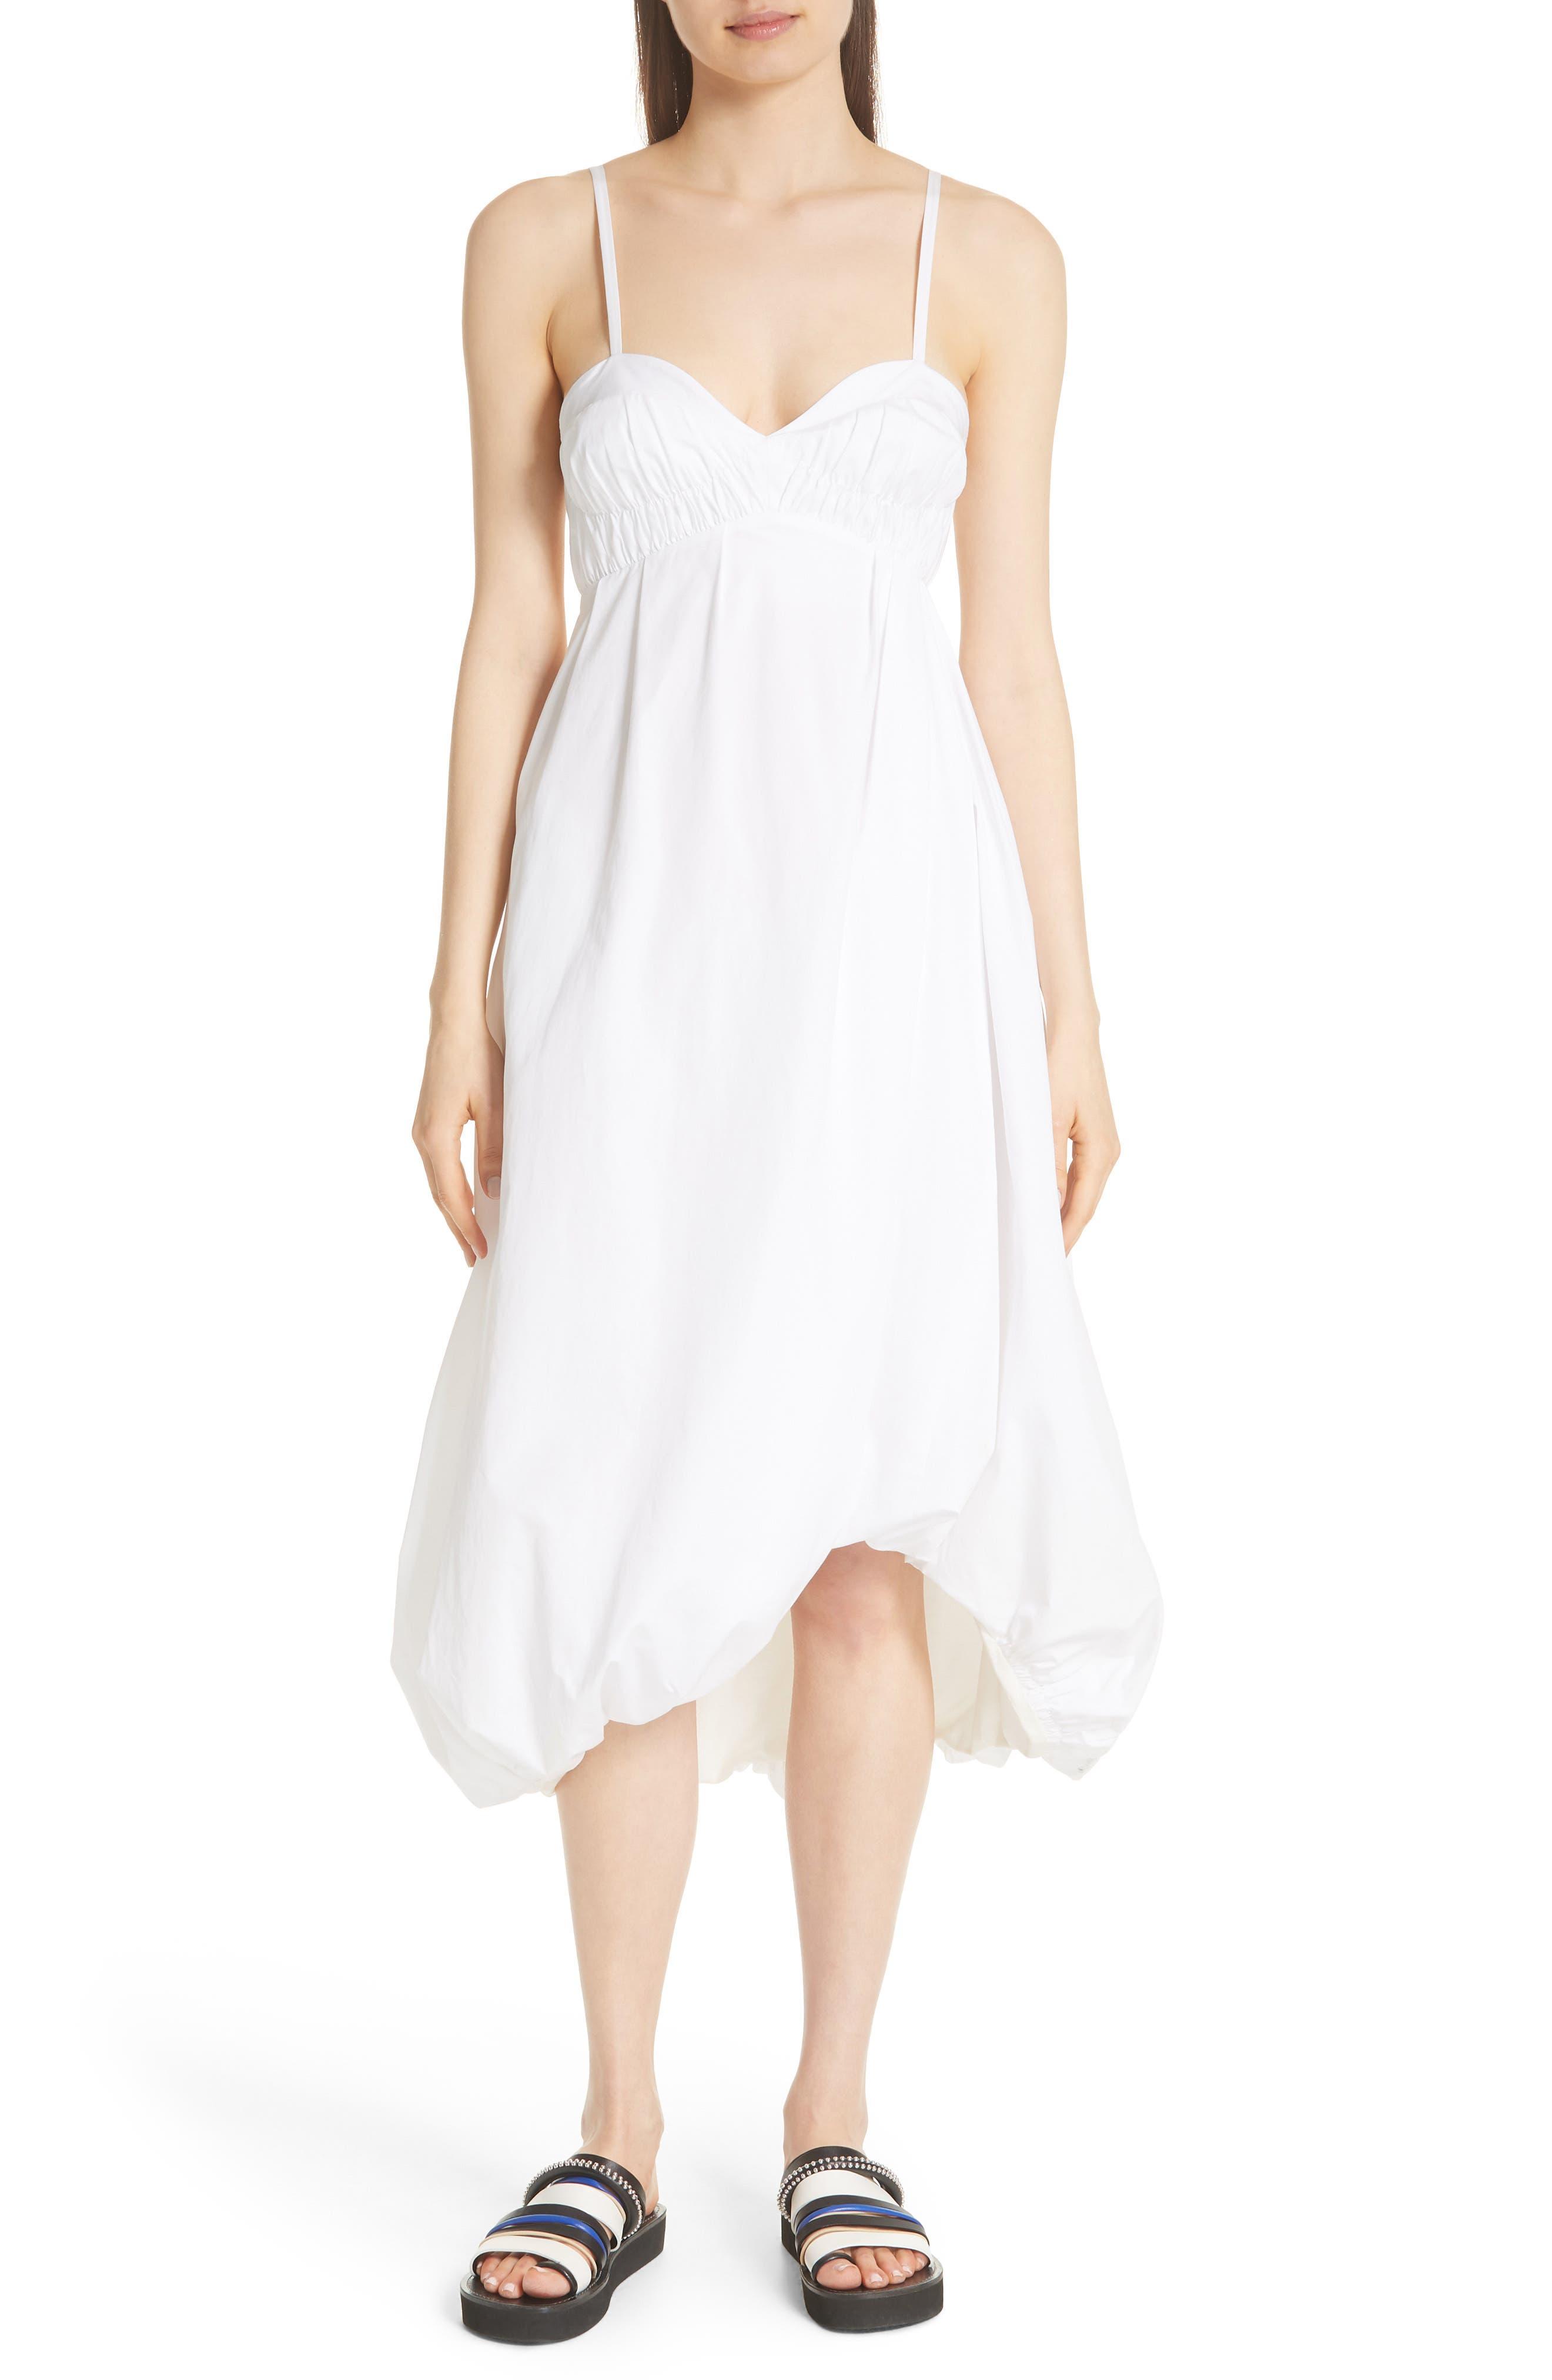 3.1 Phillip Lim Bubble Hem Dress